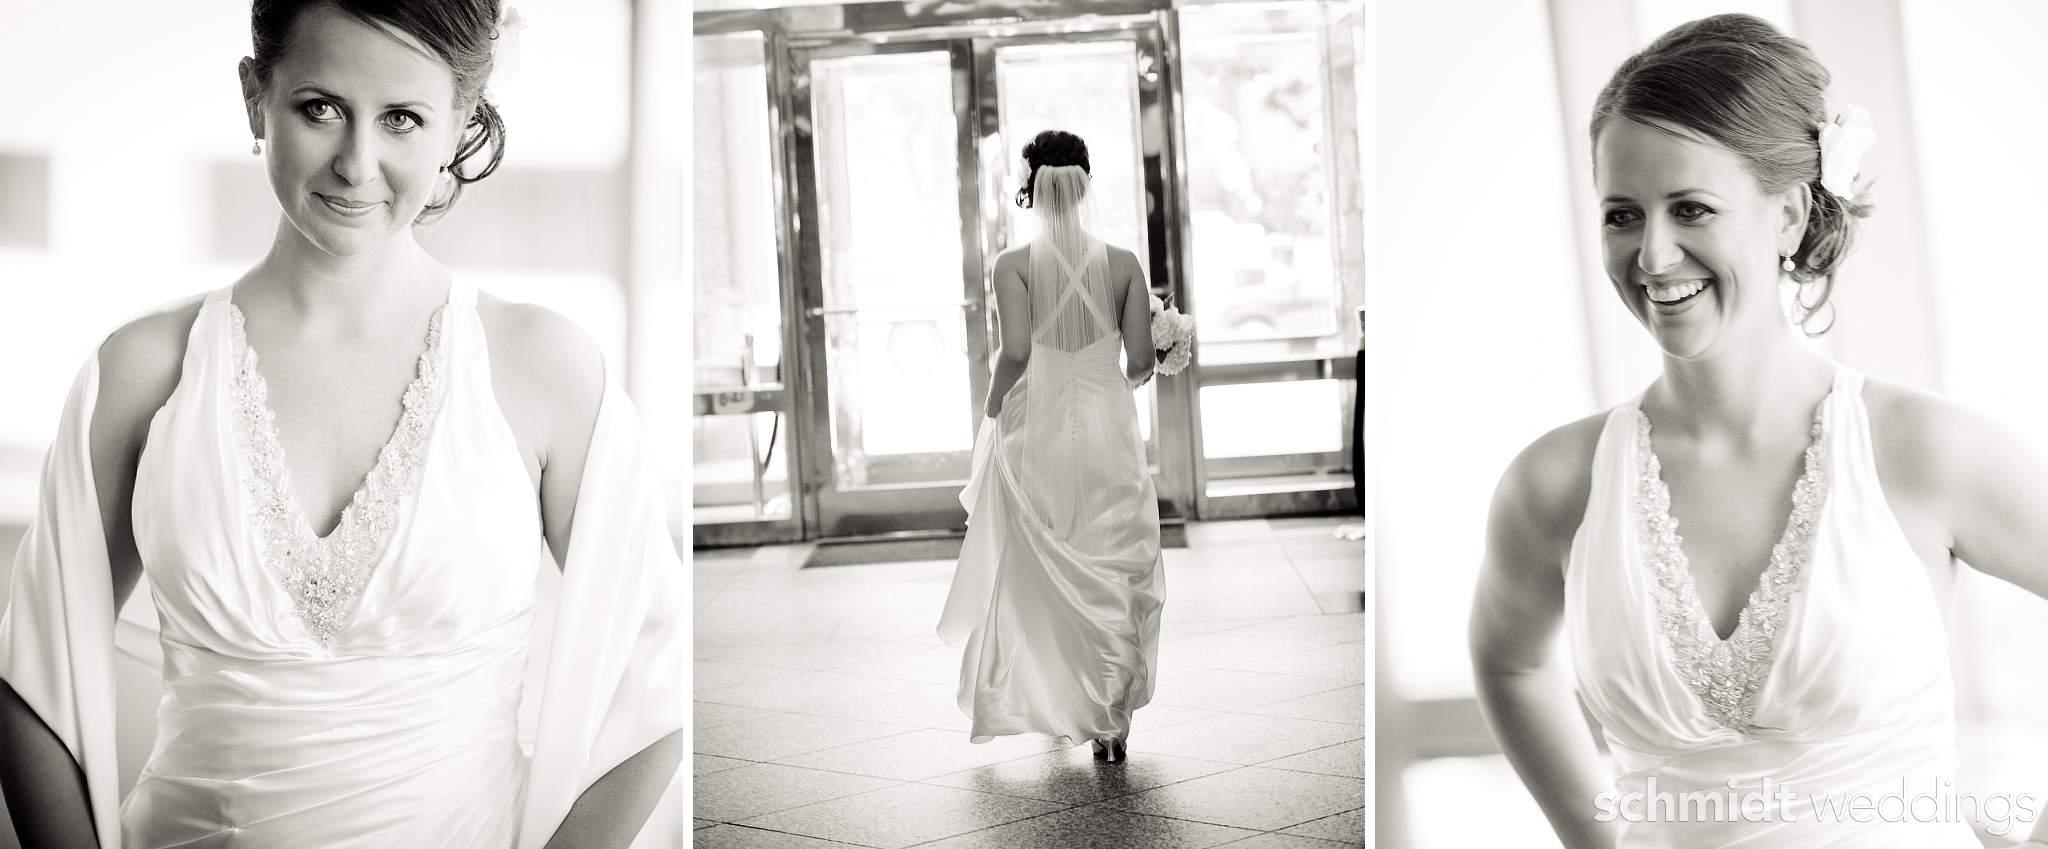 TS Photographer Chicago Wedding